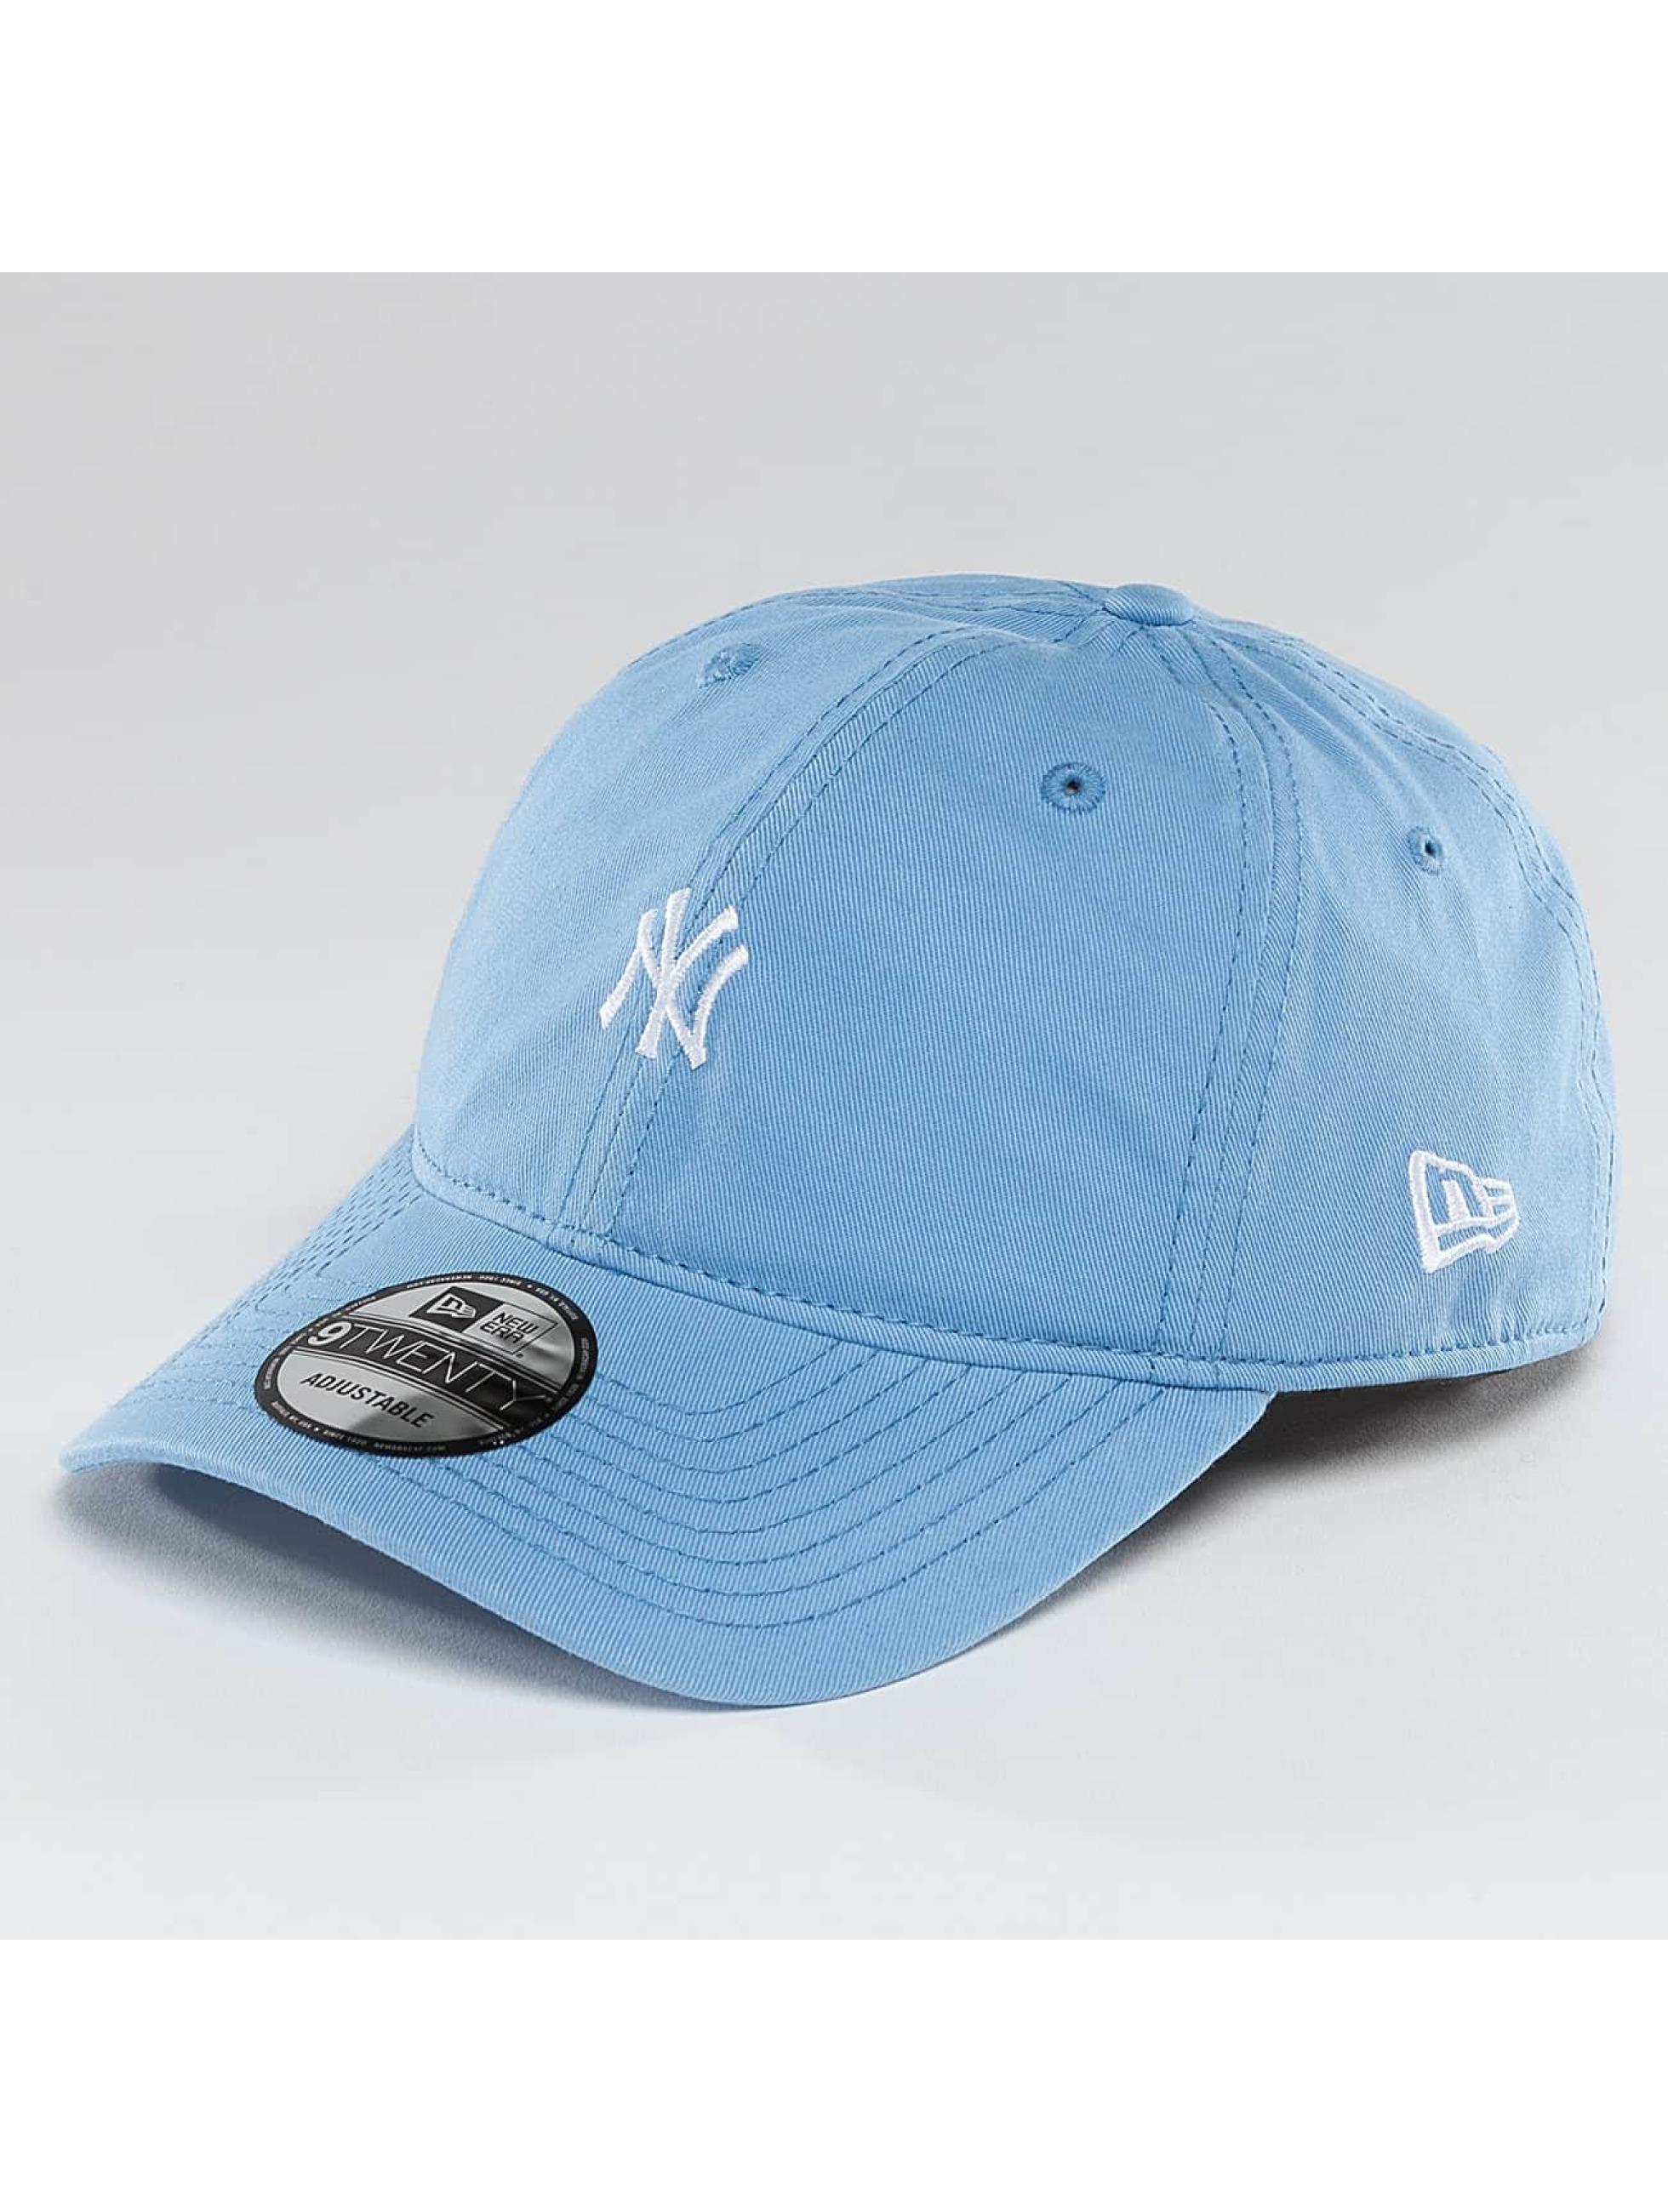 New Era Casquette Snapback & Strapback Pastel Micro NY Yankees 9Twenty bleu